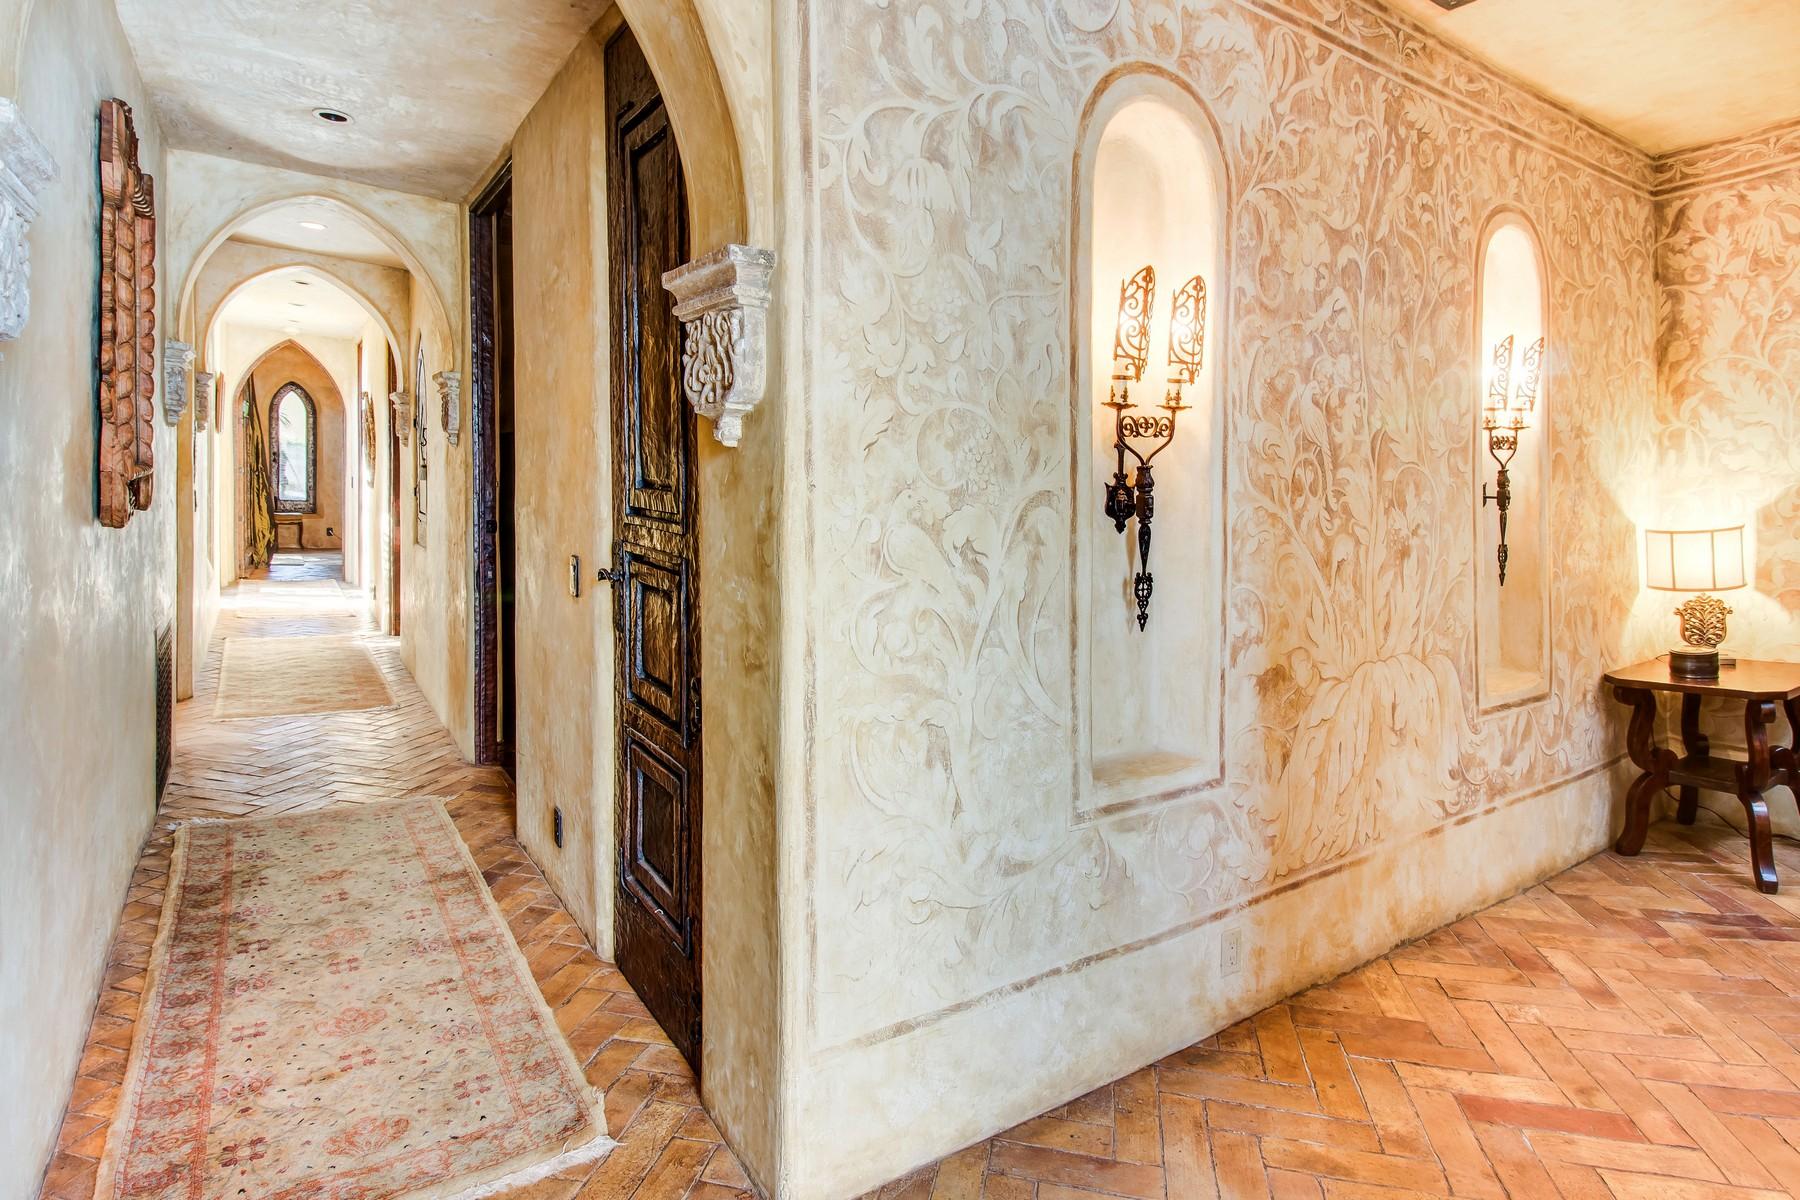 Additional photo for property listing at 412 Marine Street  La Jolla, California 92037 Estados Unidos